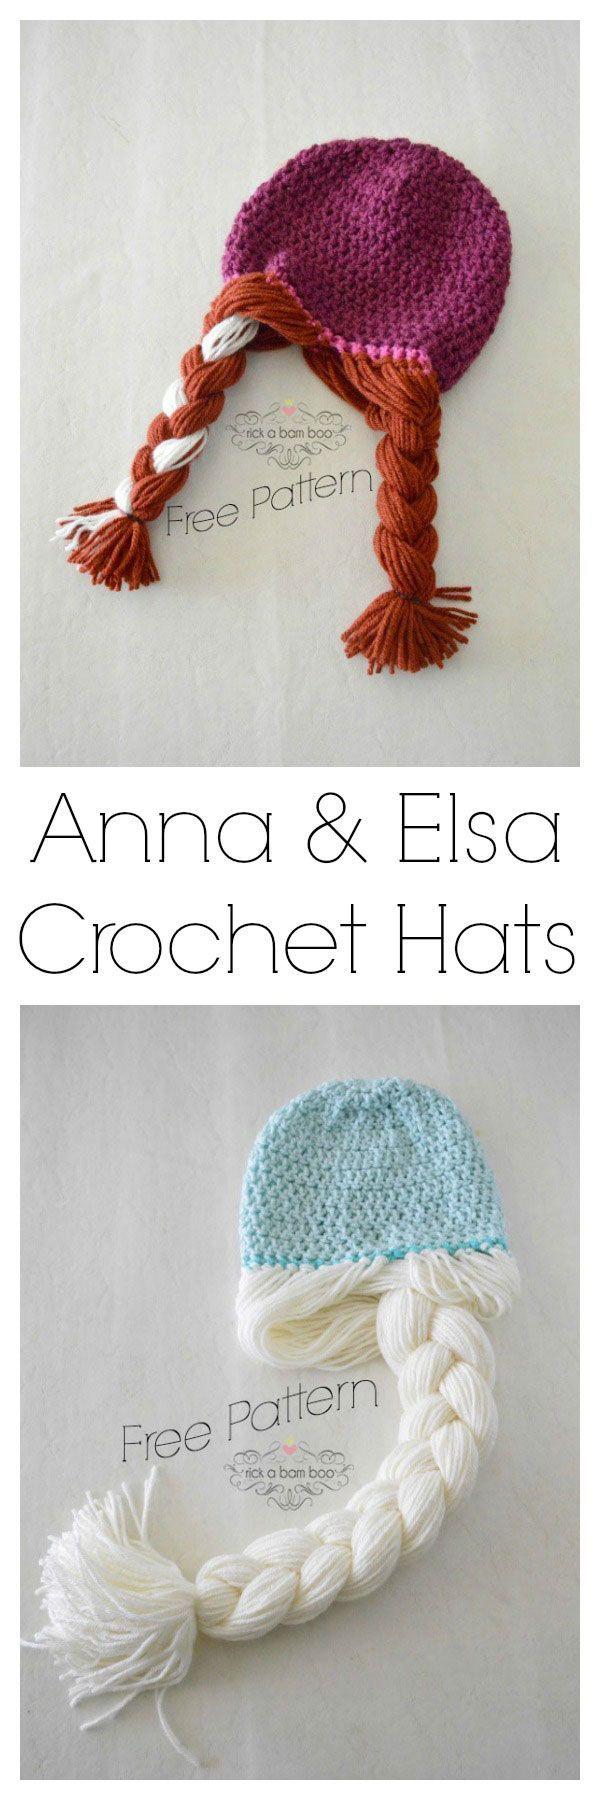 Anna & Elsa Crochet Hats | Free Pattern | Braided Beanie | Costume | Dress up | Disney Princess | Frozen